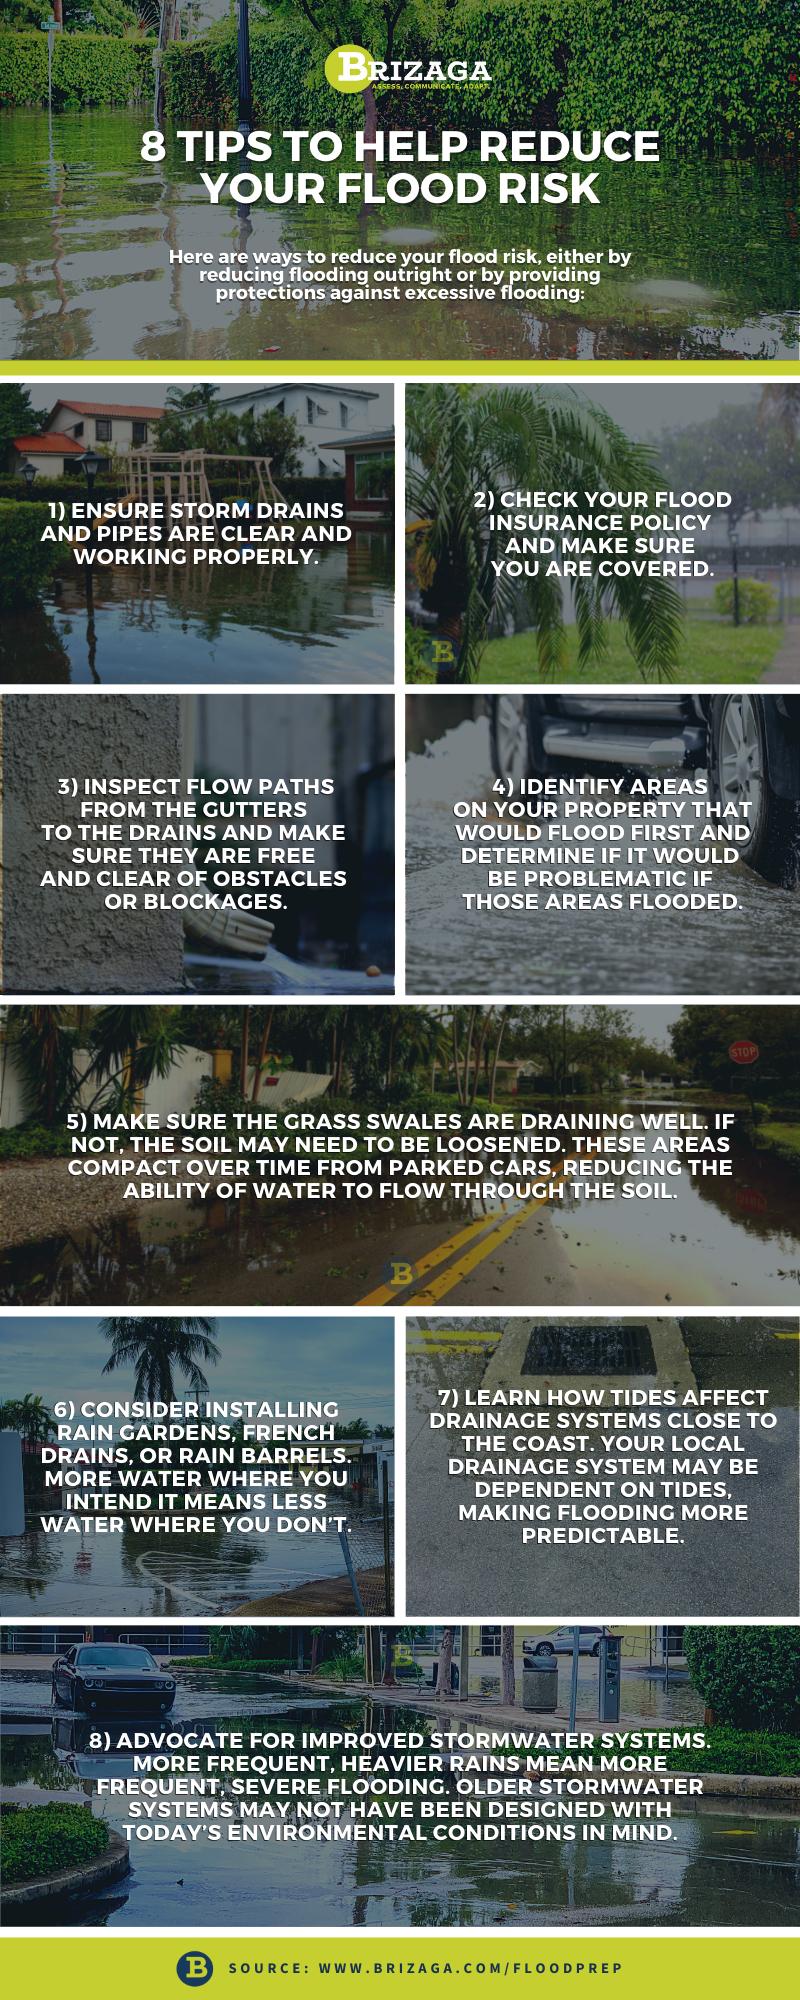 8 Tips to Help Reduce Your Flood Risk - Brizaga ( www.brizaga.com)